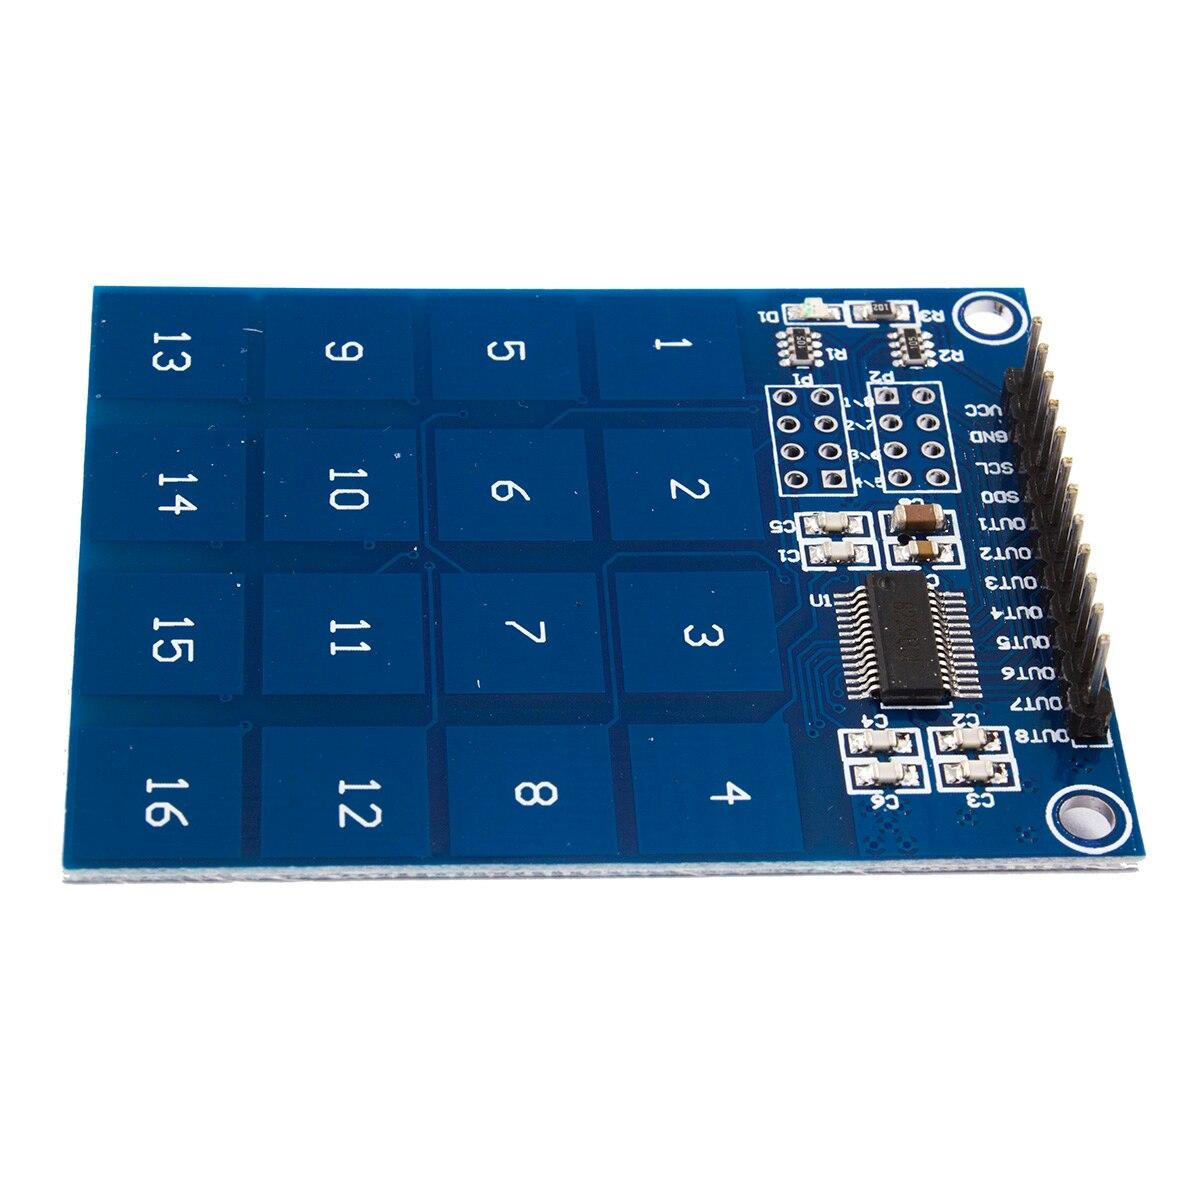 Ttp229 16 Way Capacitive Touch Switch Digital Touch Sensor Modulein